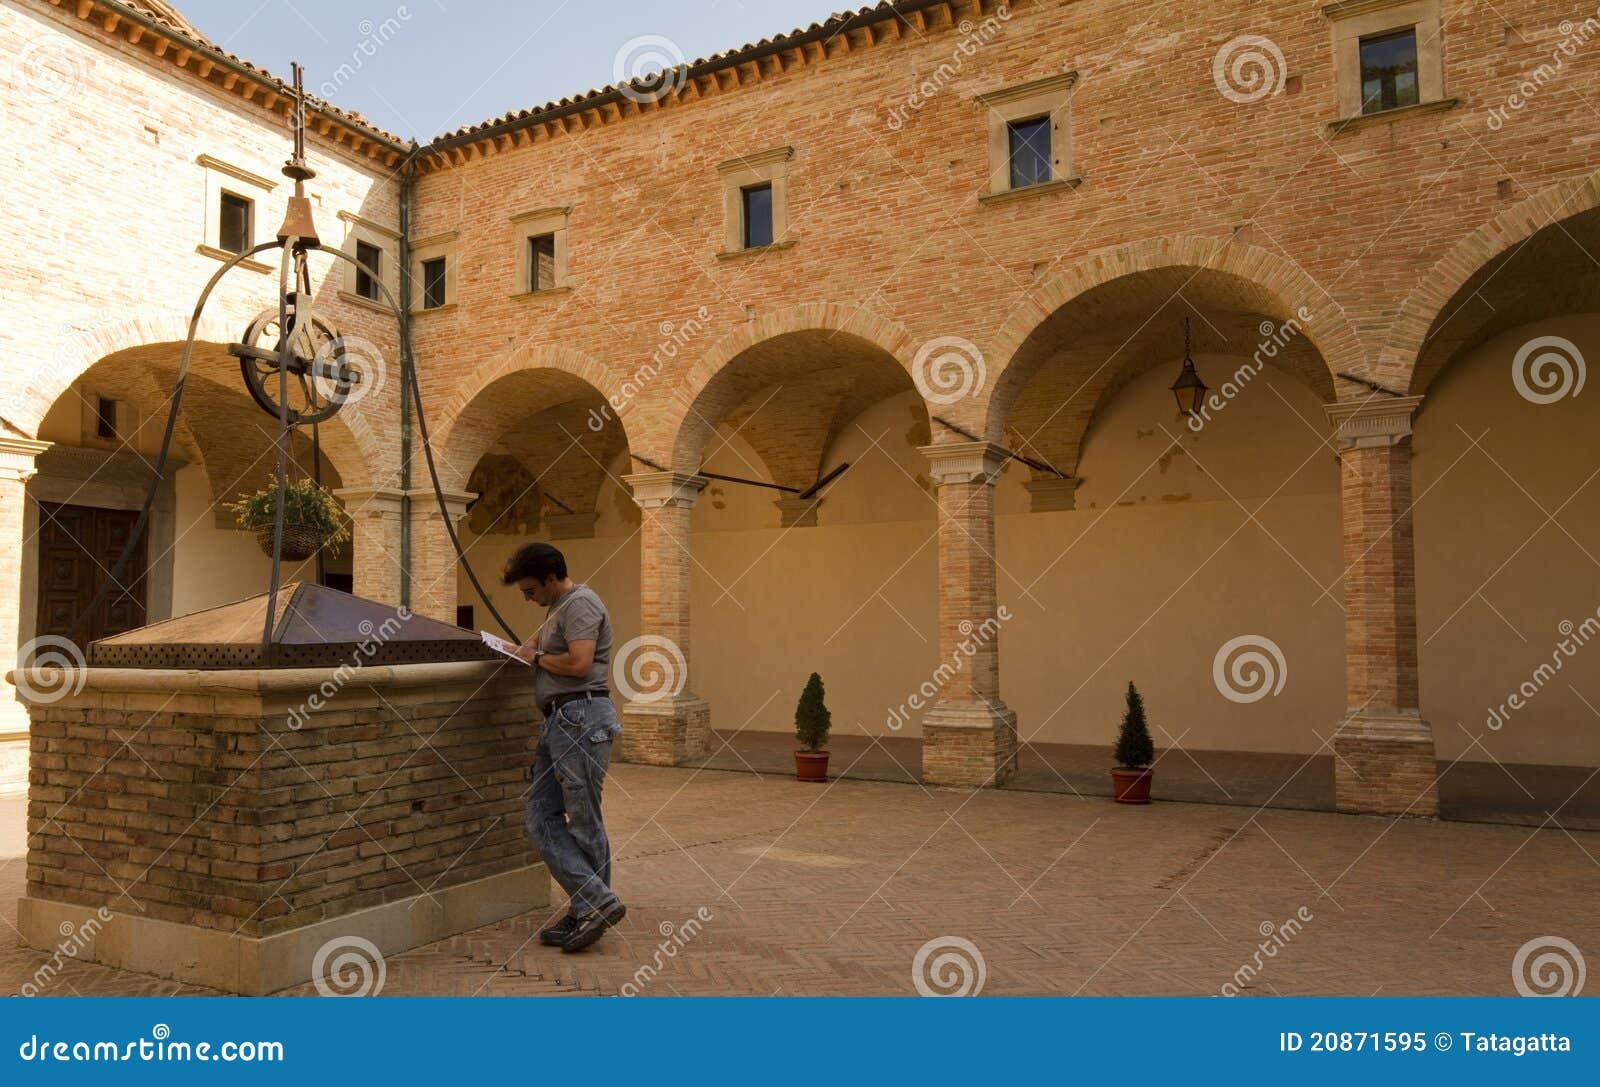 Erwachsener Tourist in historischer Toskana und in Umbrien, Ital